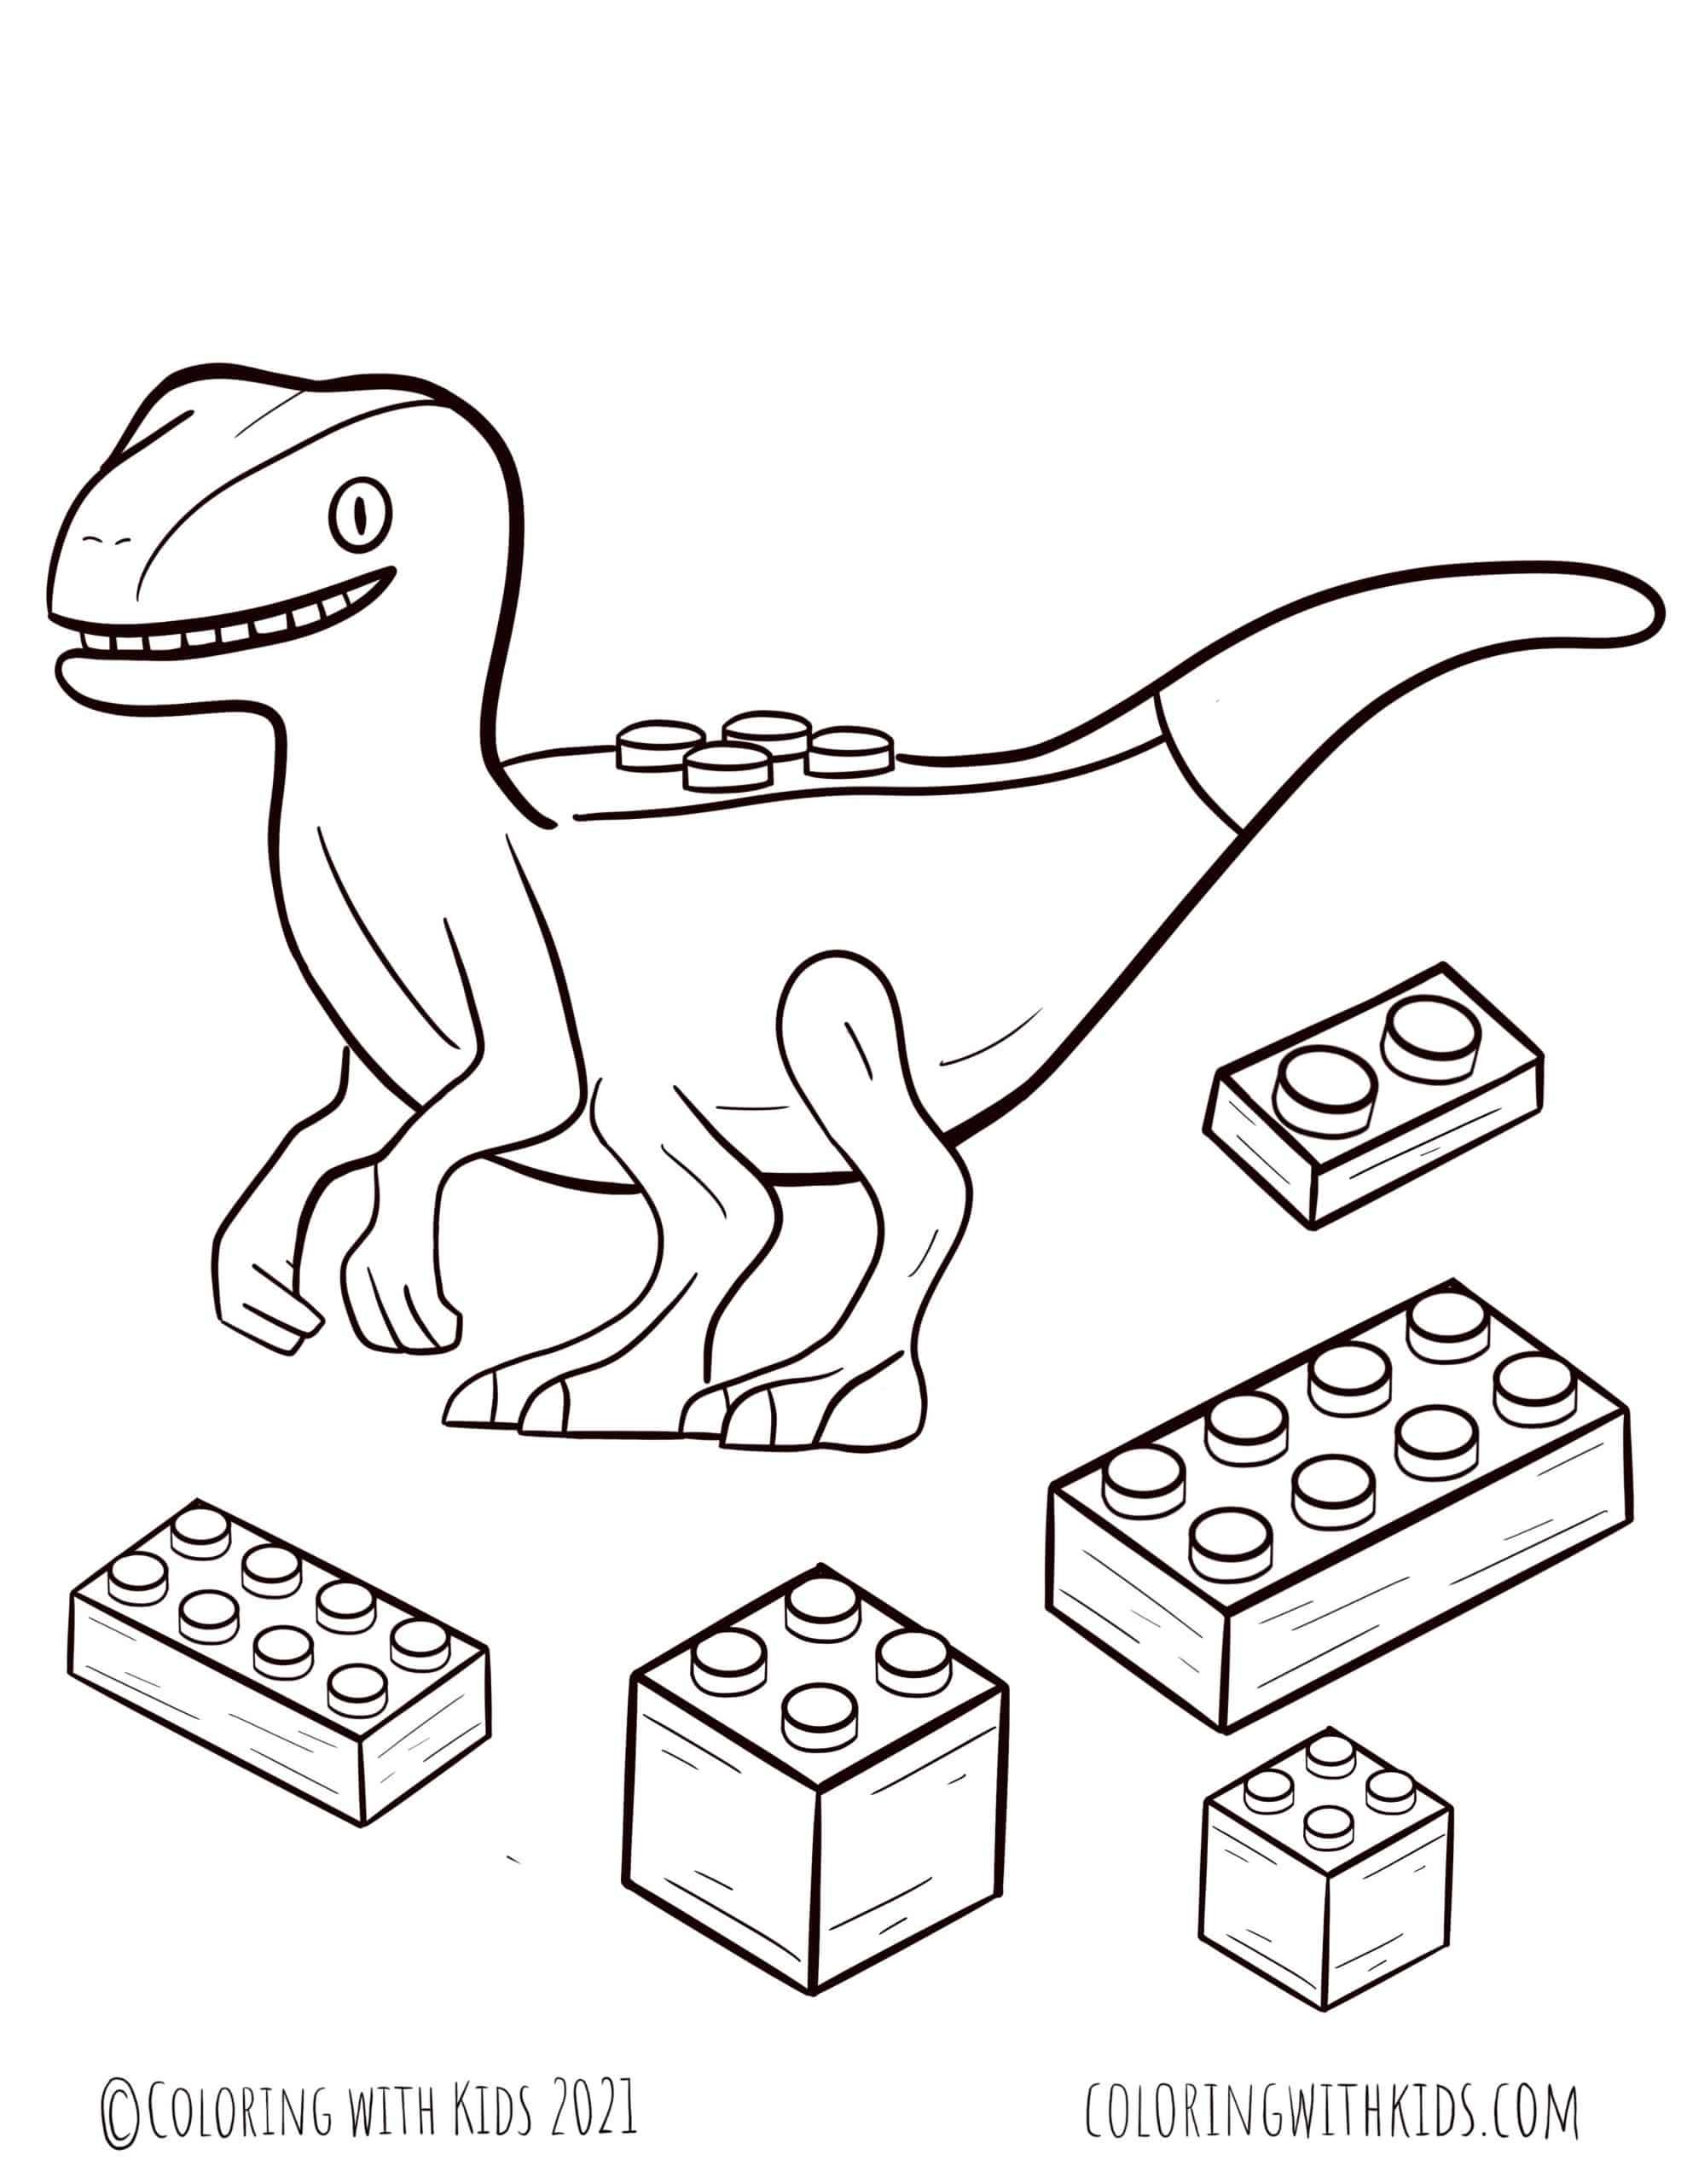 Dinosaur Lego Coloring Page